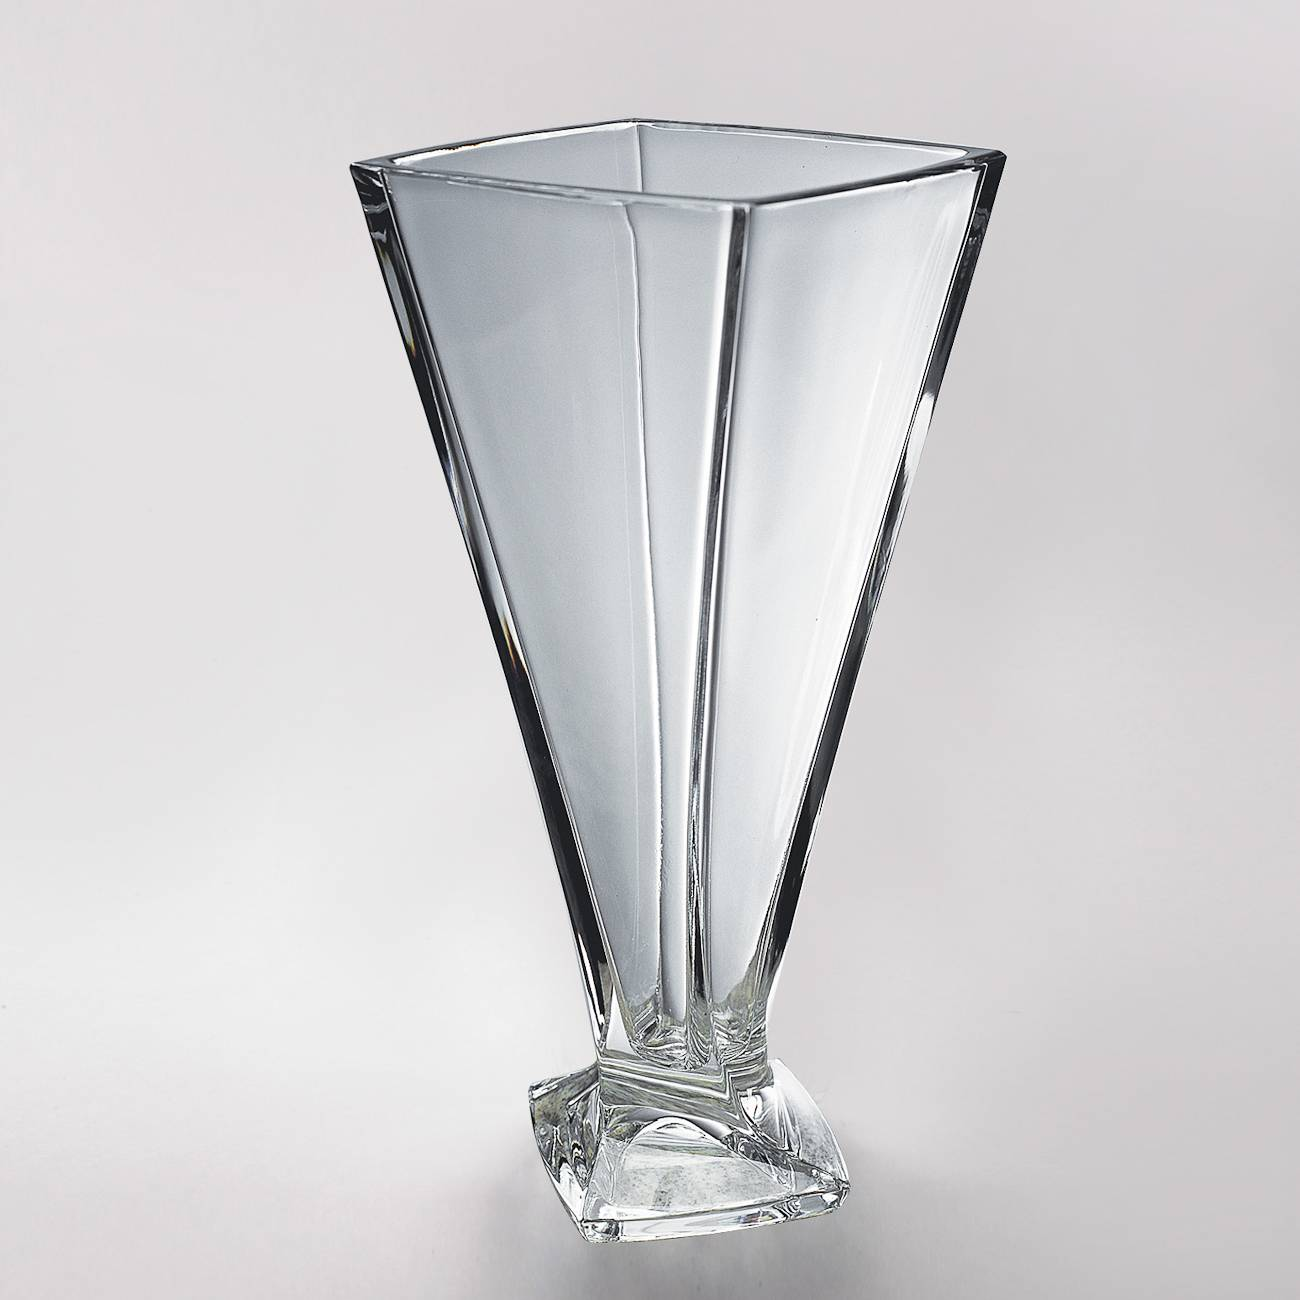 Vaso Quadro em Cristal - Bohemia Crystalite - 28 cm